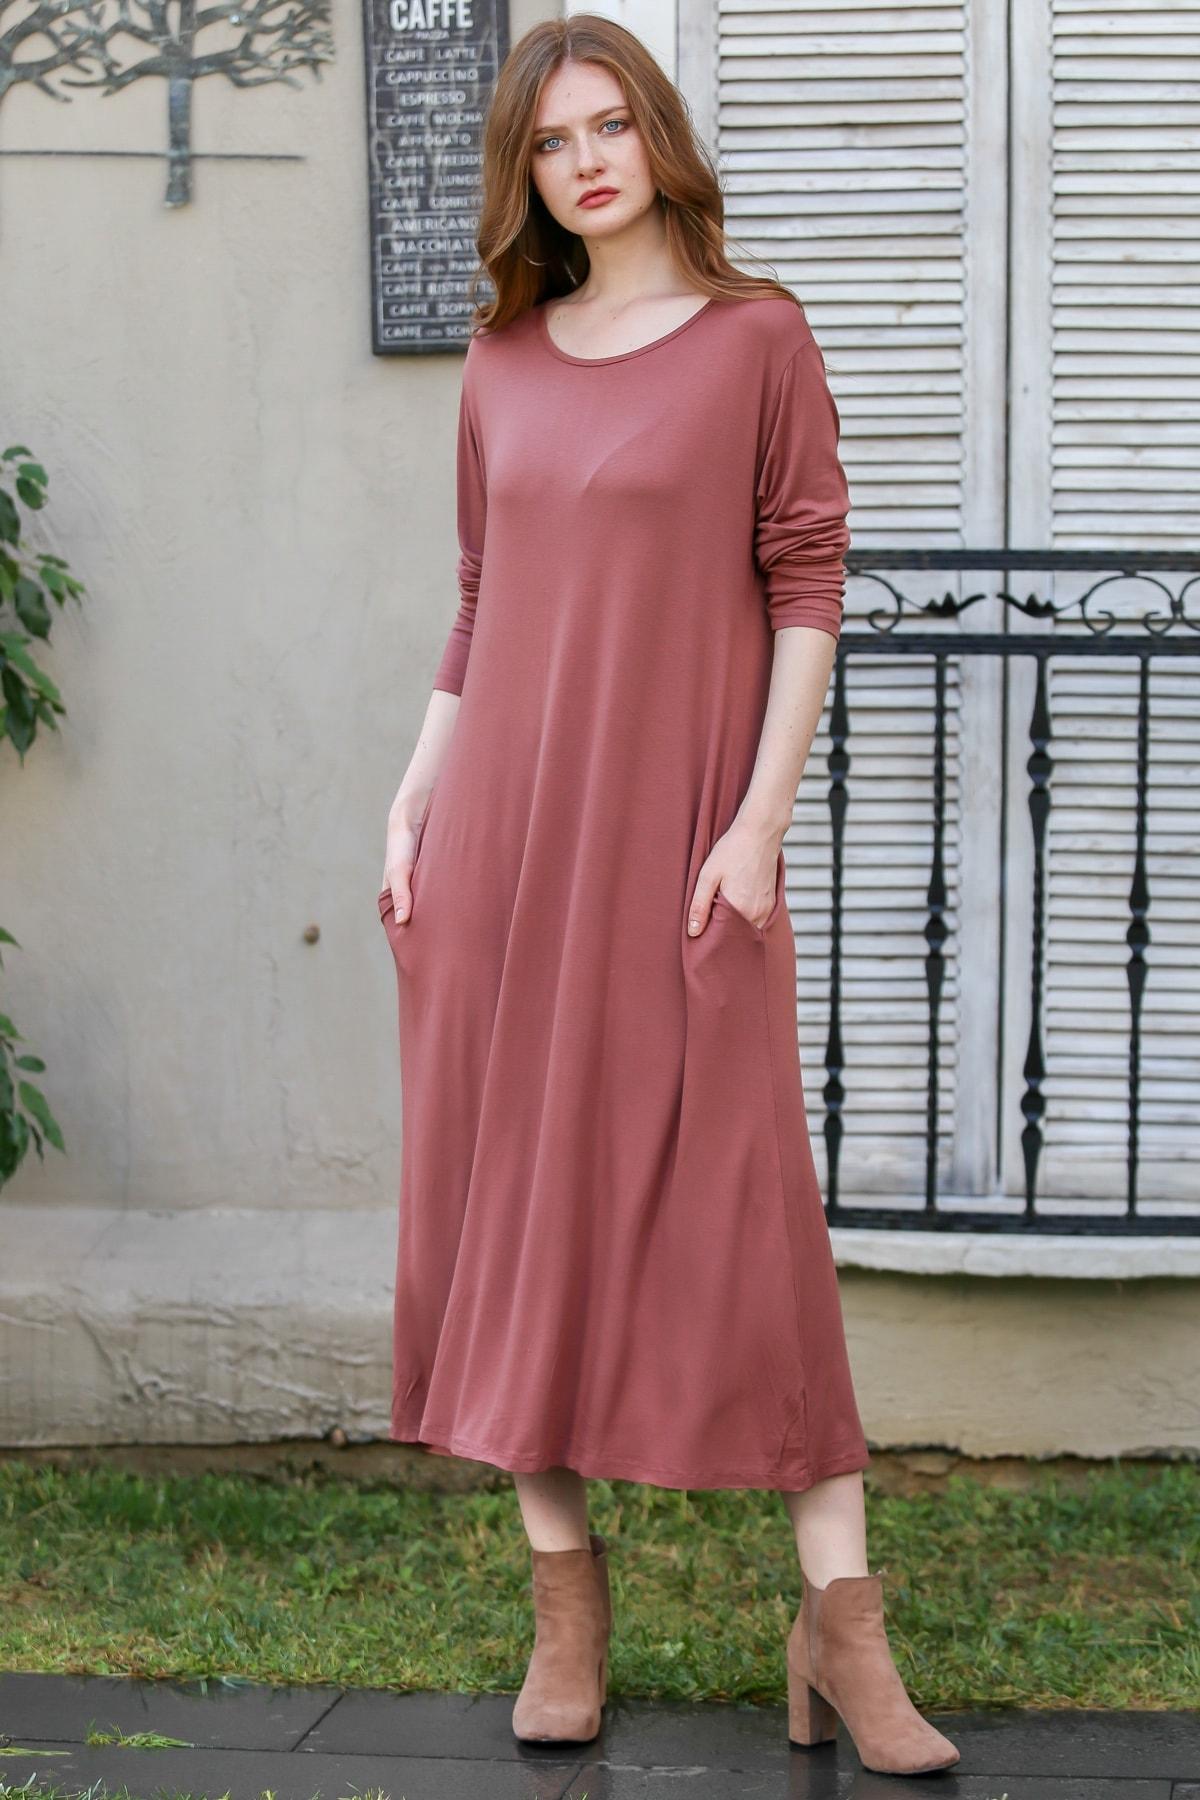 Chiccy Kadın Gül Kurusu Vintage Gizli Cepli Salaş Elbise M10160000EL97767